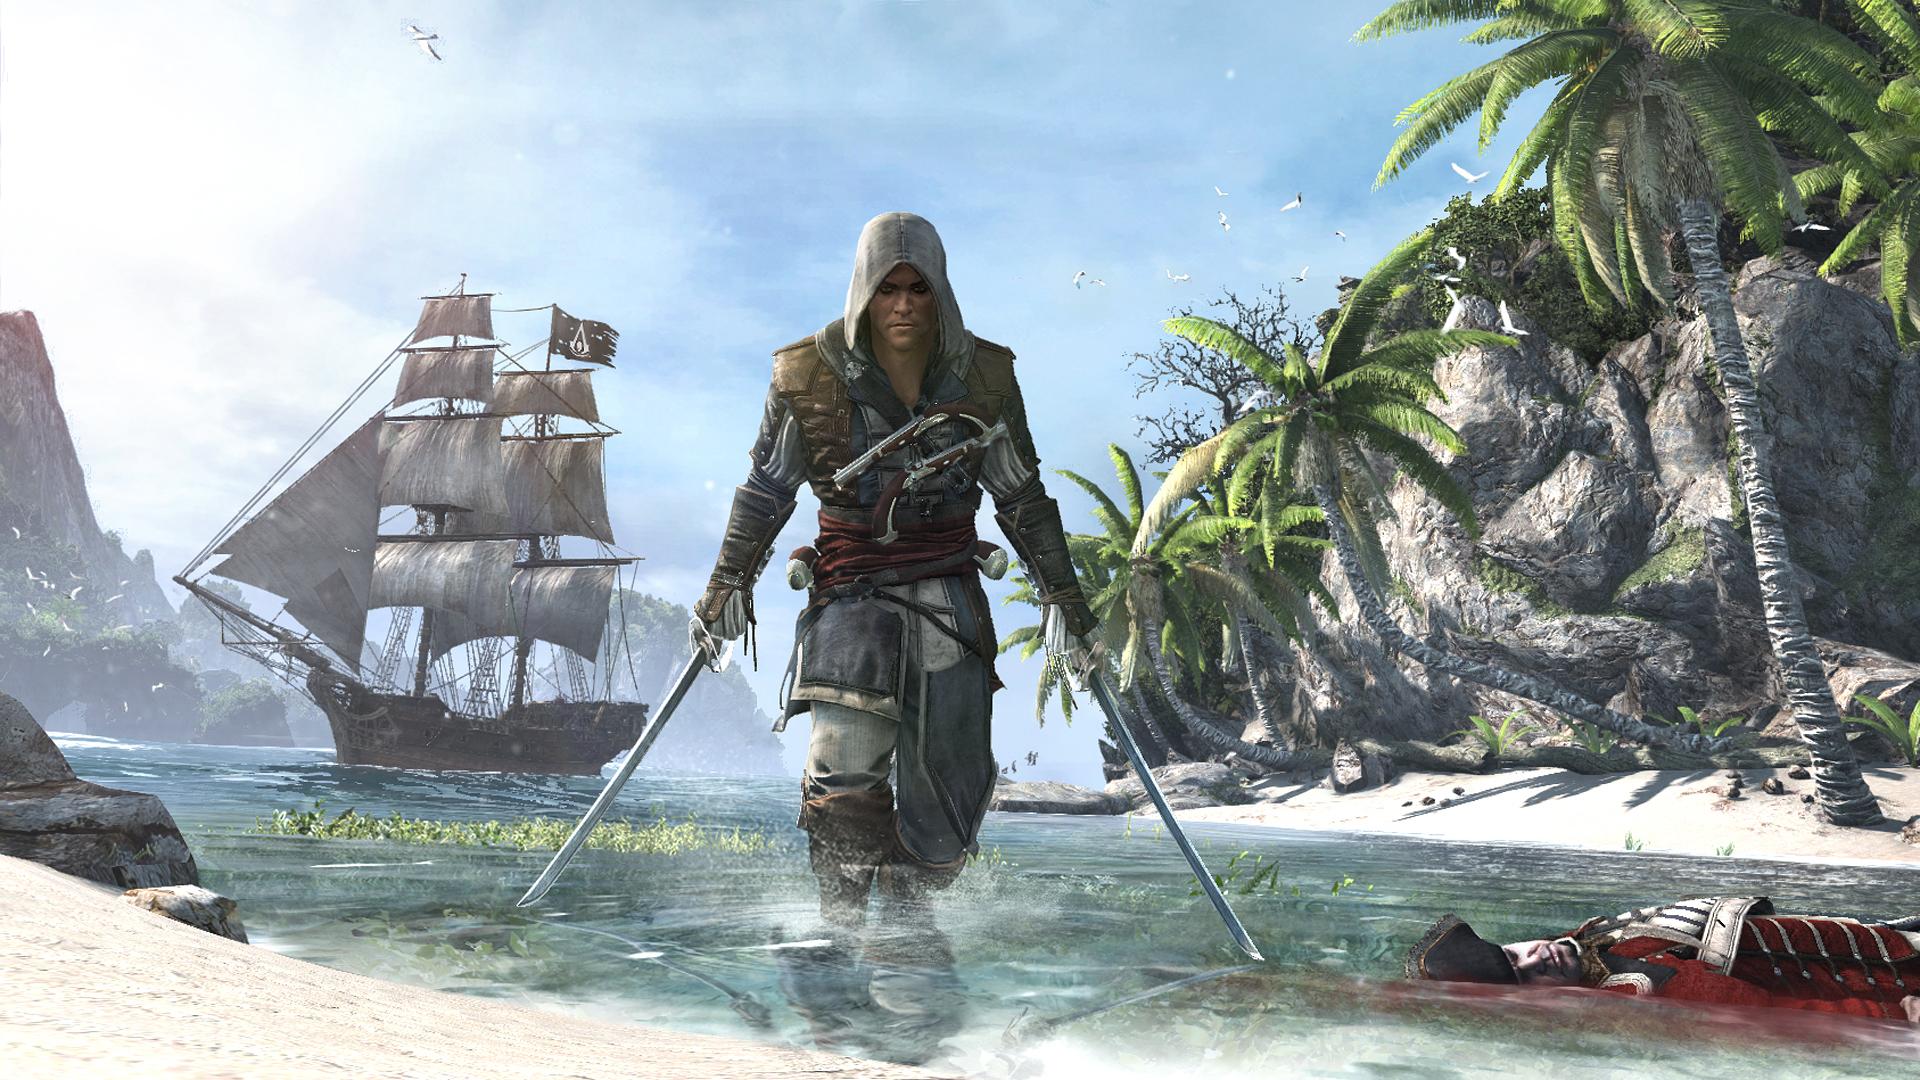 Save 67% on Assassin's Creed® IV Black Flag™ on Steam